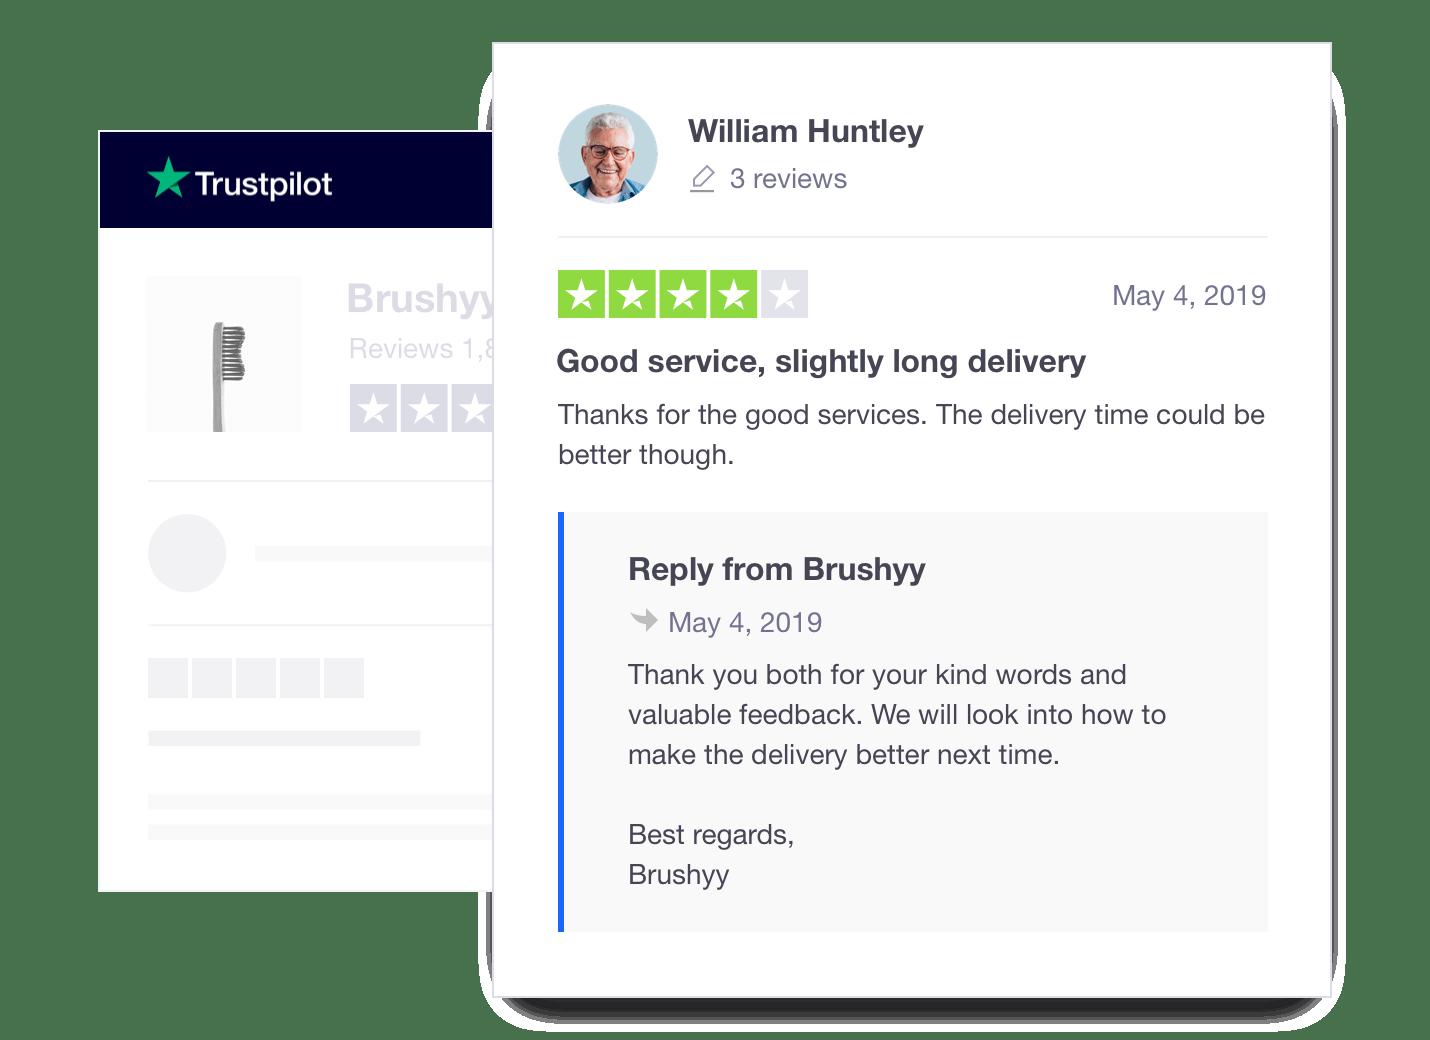 Trustpilot company response to consumer review